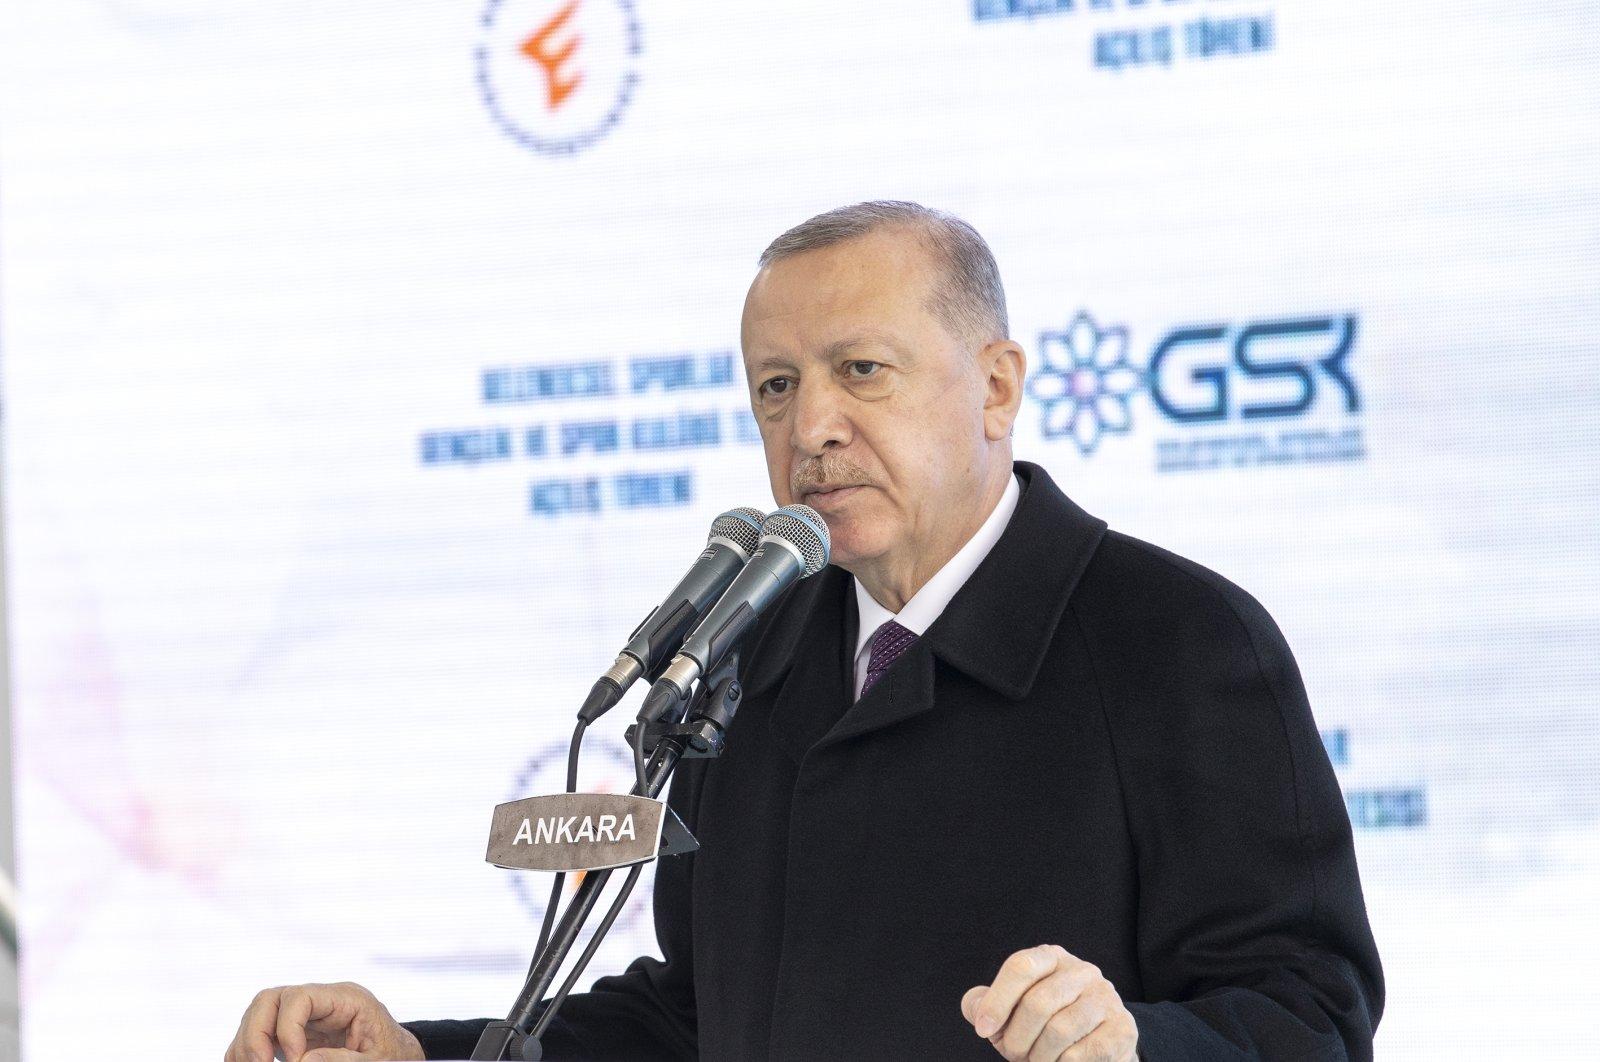 President Recep Tayyip Erdoğan speaks at a sports complex opening ceremony in the capital Ankara, Jan. 12, 2021. (AA Photo)